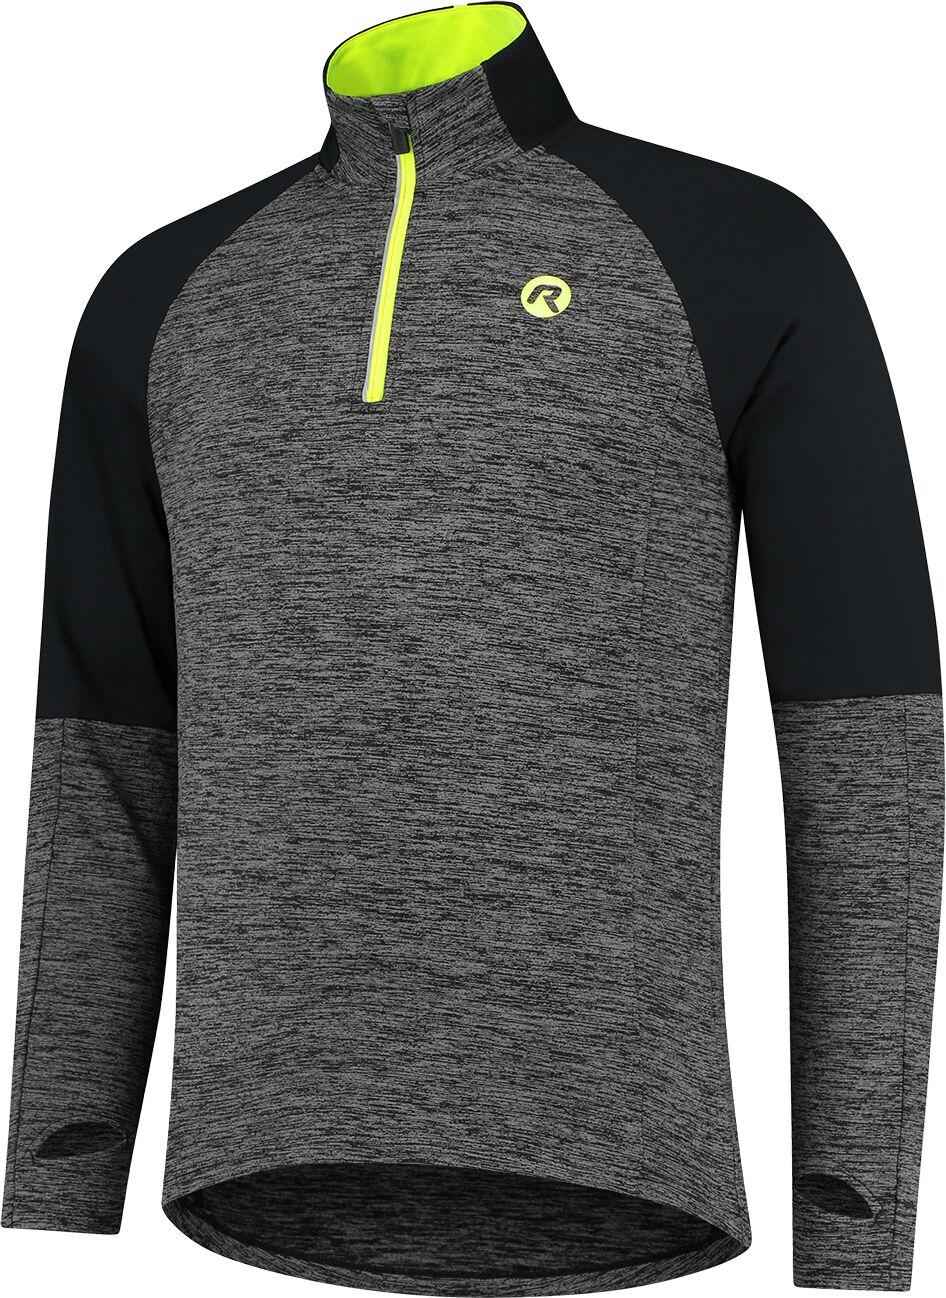 ROGELLI męska bluza do biegania ENJOY black/grey ROG351102 Rozmiar: XL,ROG351102.S